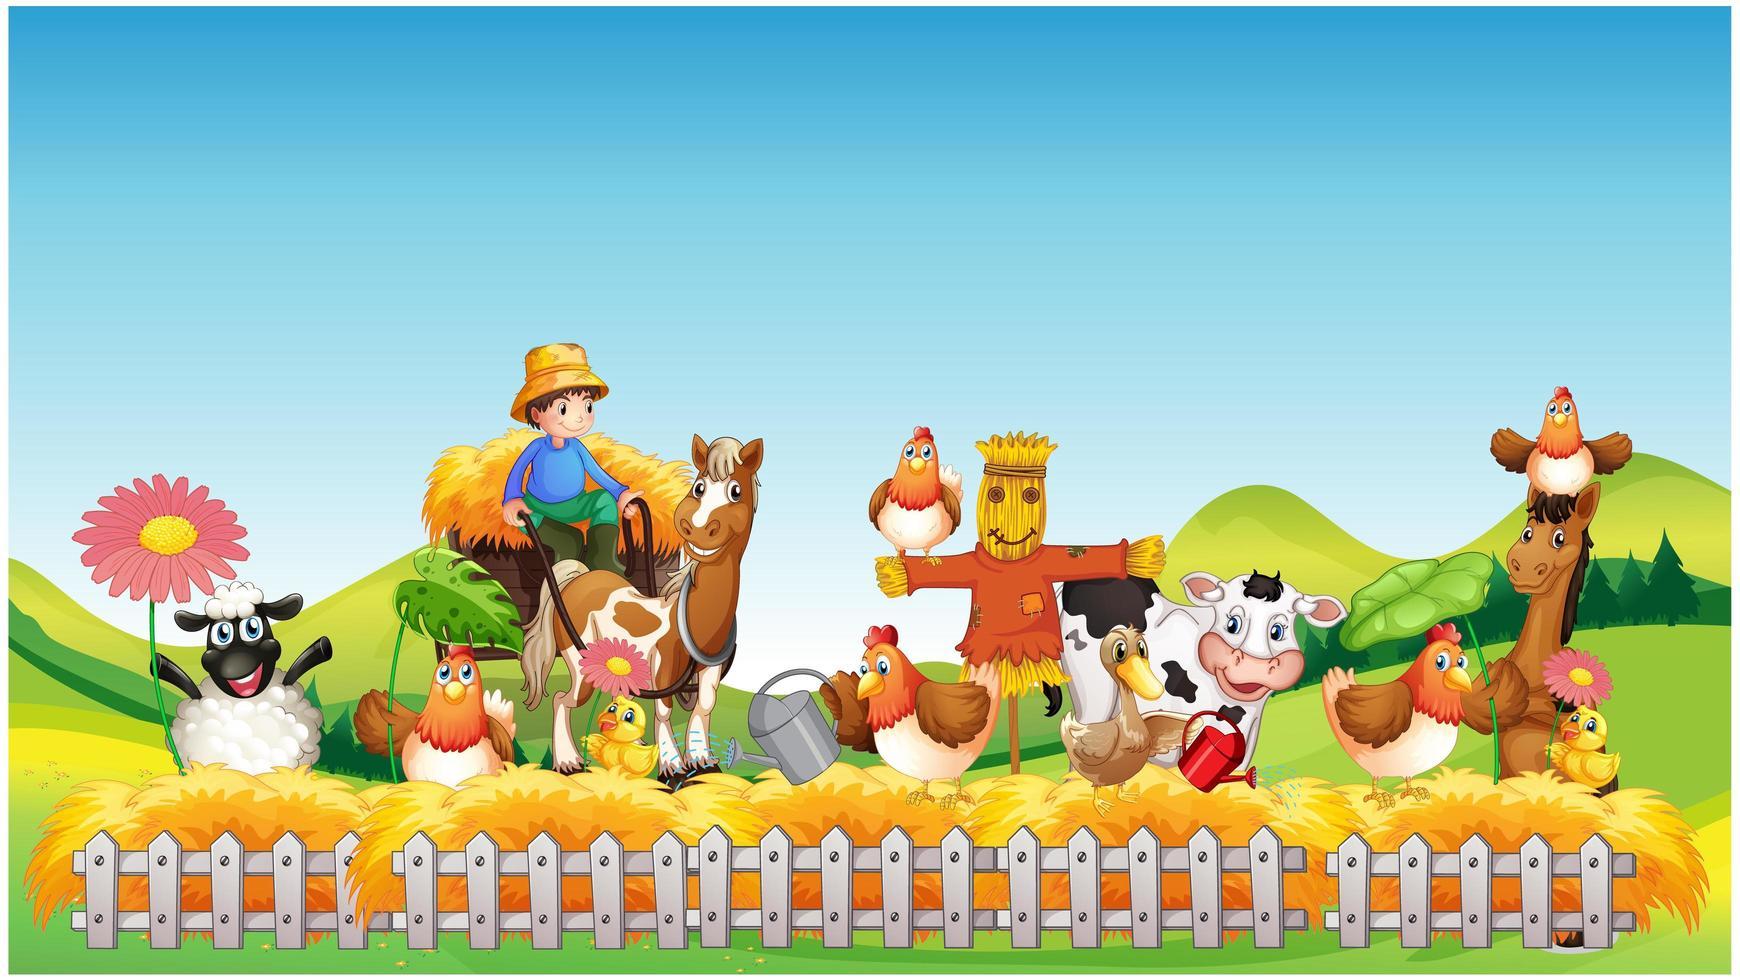 Bauernhofszene mit Tierkarikaturstil vektor